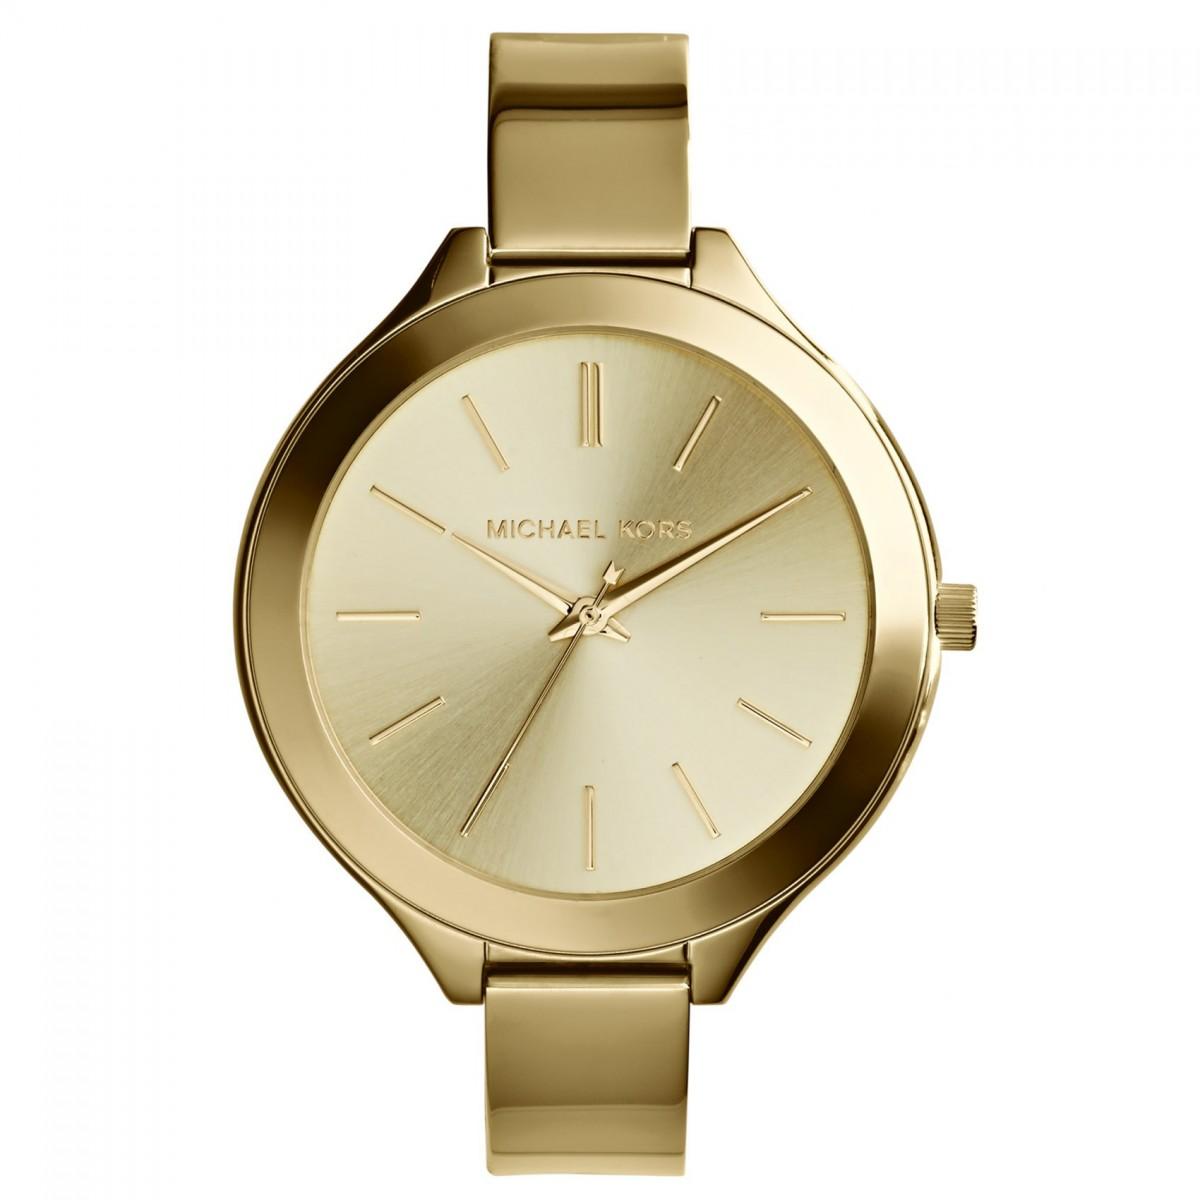 Compre Relógio Michael Kors Runway Slim em 10X   Tri-Jóia Shop 528ff98fdc